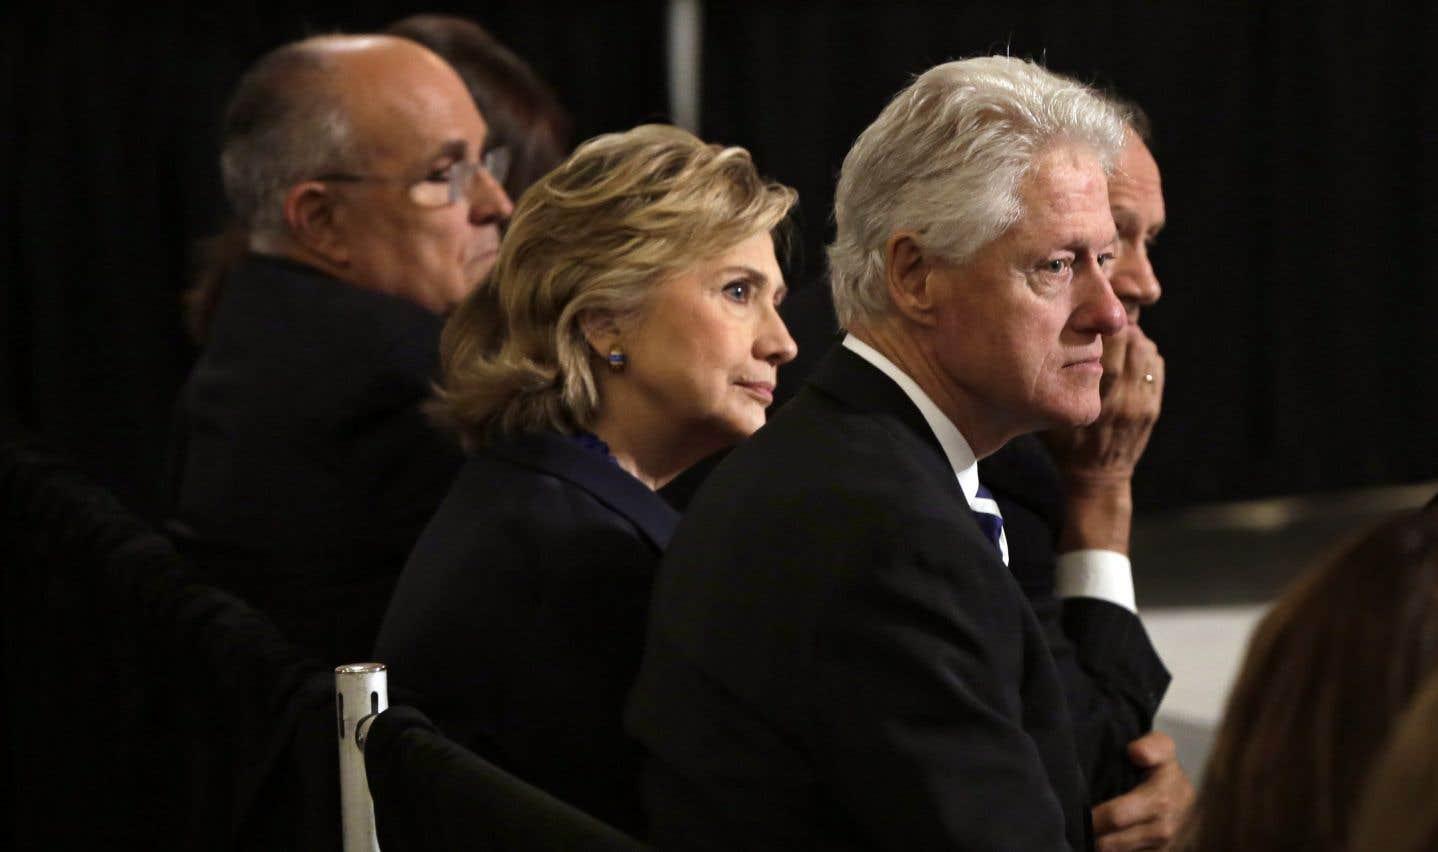 L'ex-secrétaire d'État Hillary Clinton et son mari, Bill Clinton